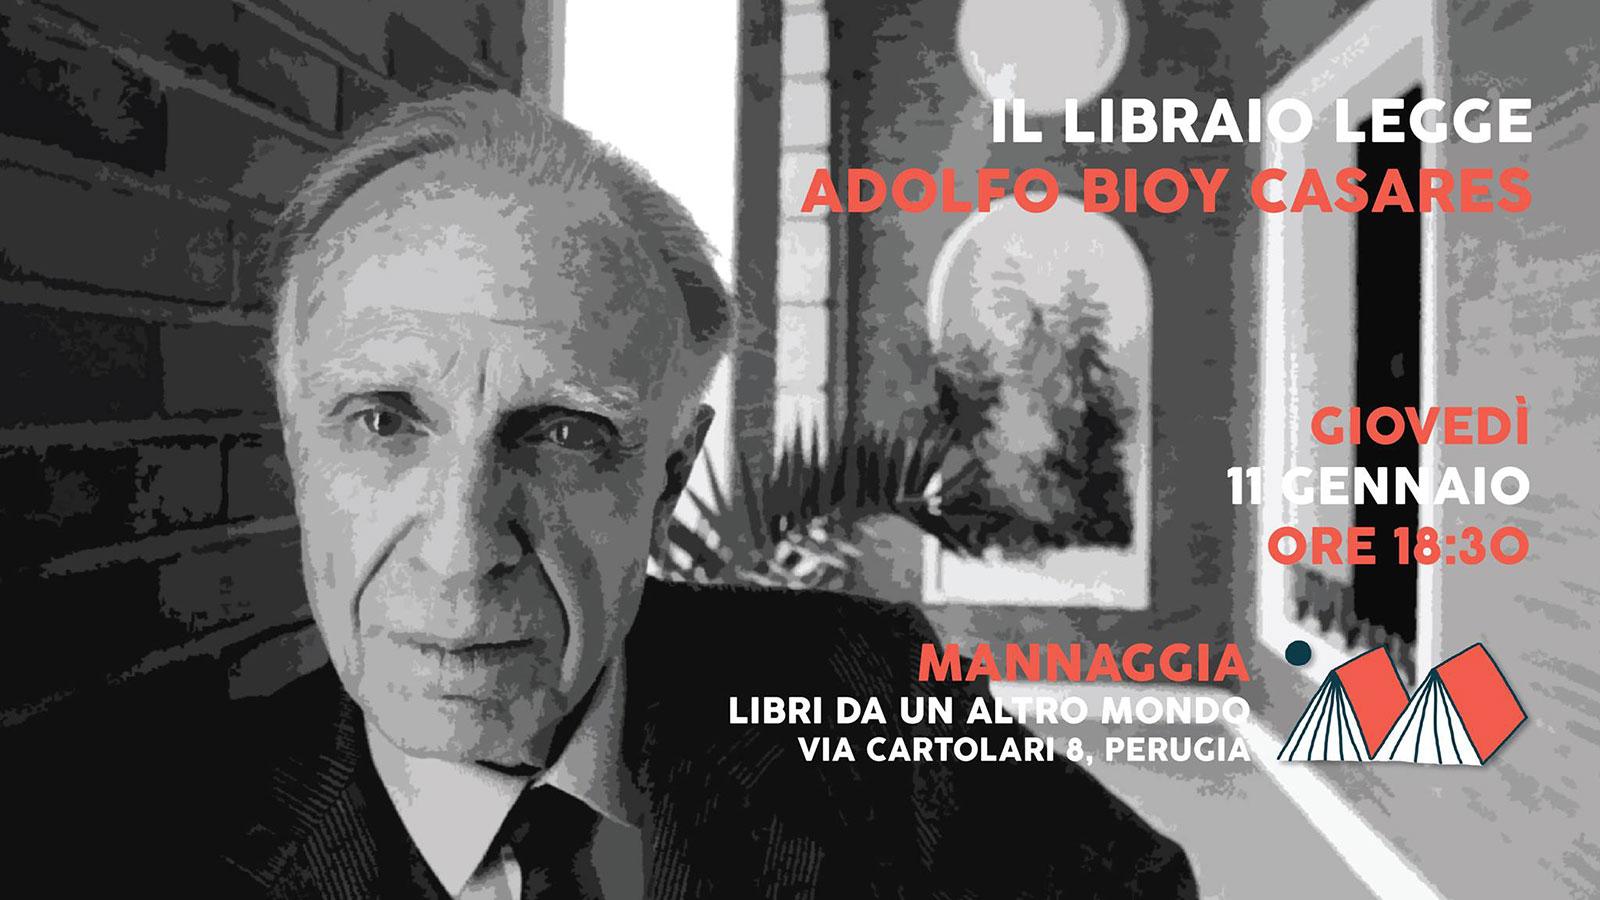 Il libraio legge Adolfo Bioy Casares